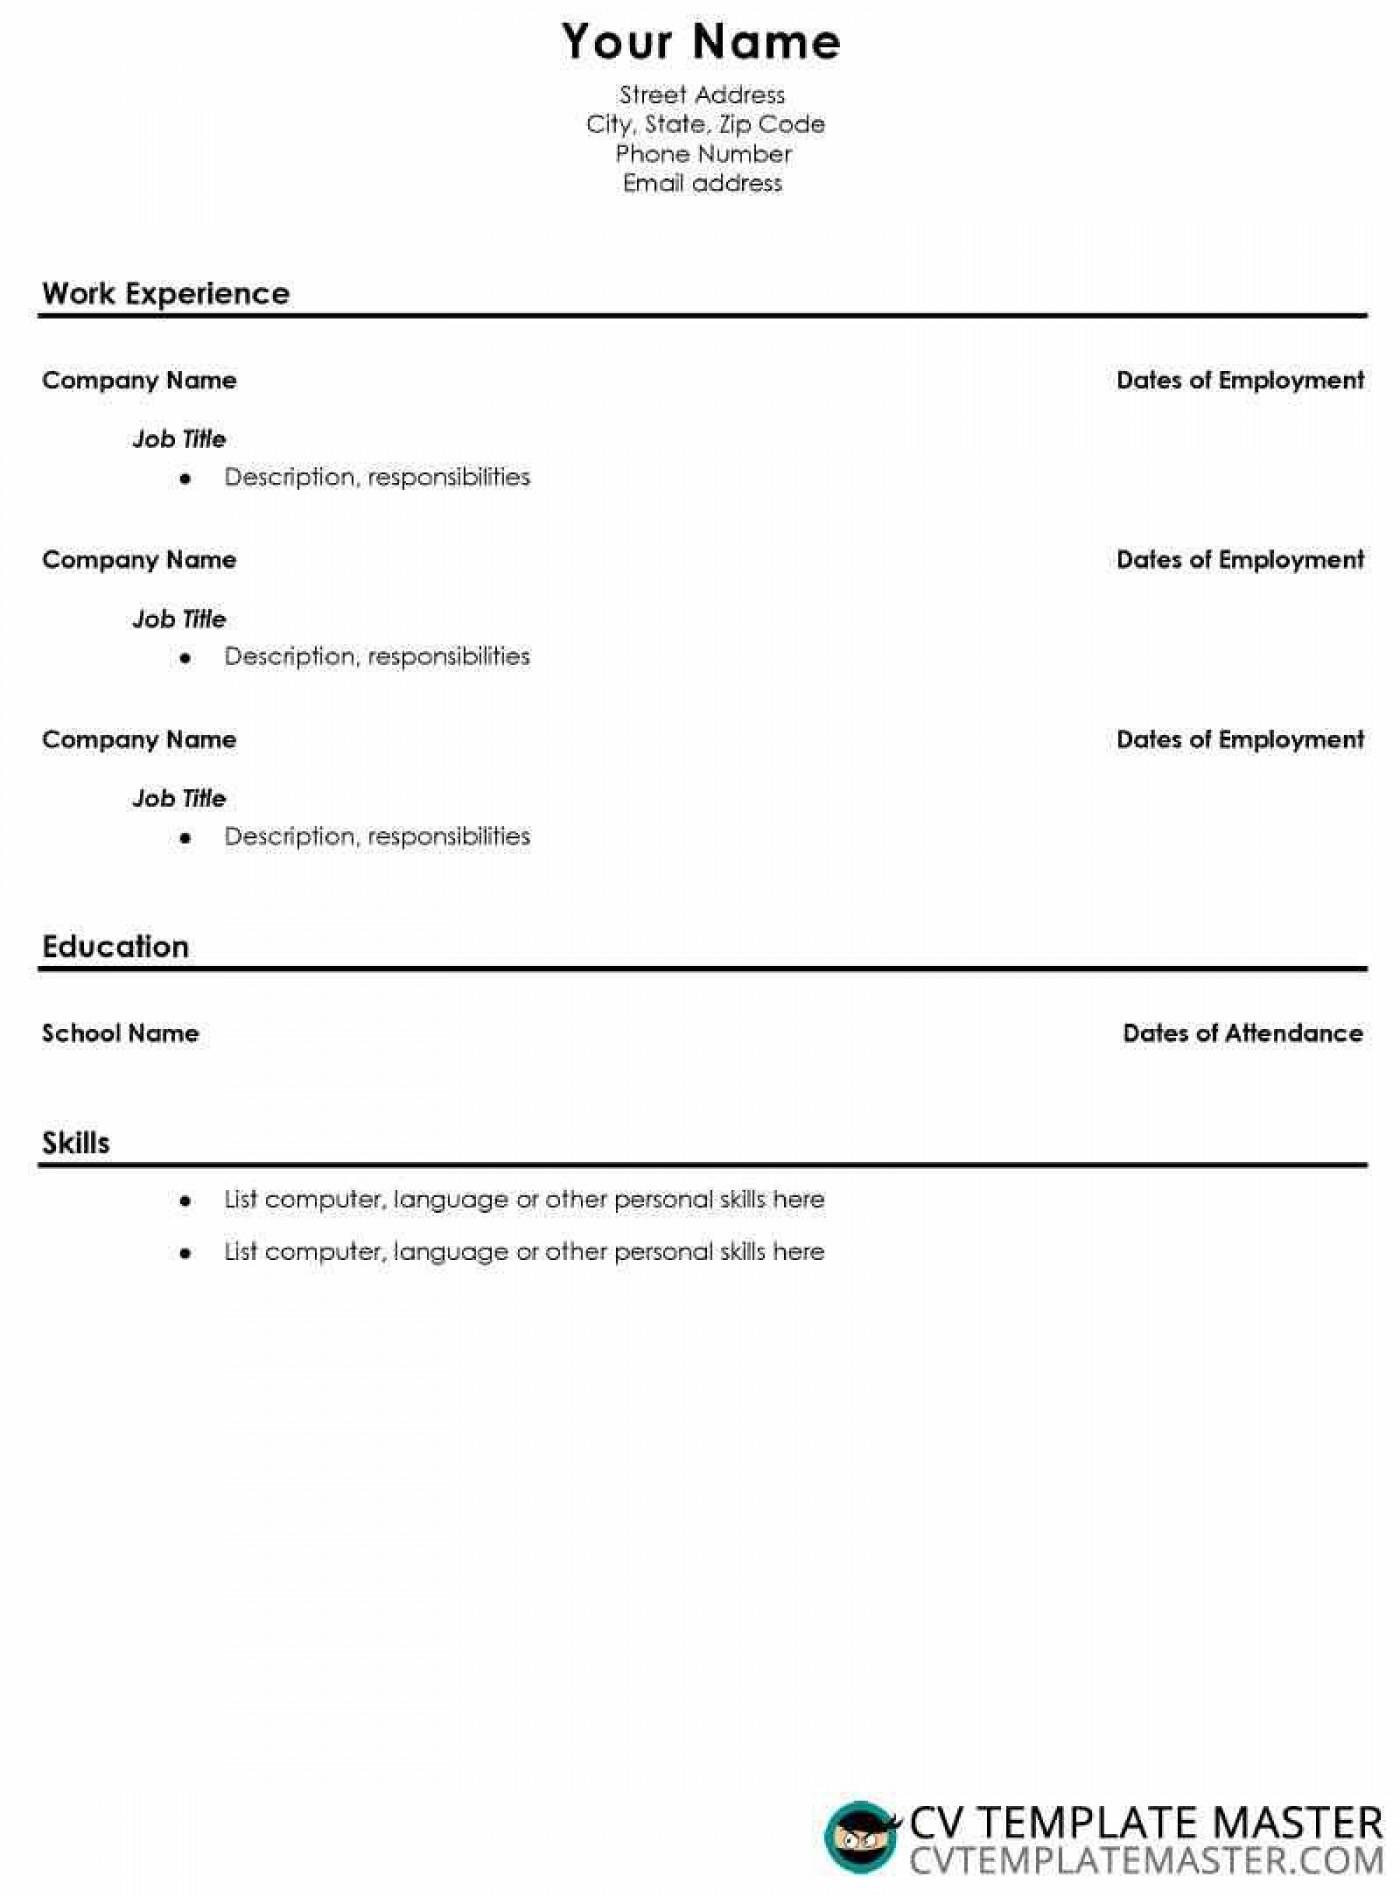 007 Frightening Resume Template High School Concept  Student Australia For Google Doc Graduate Microsoft Word1400